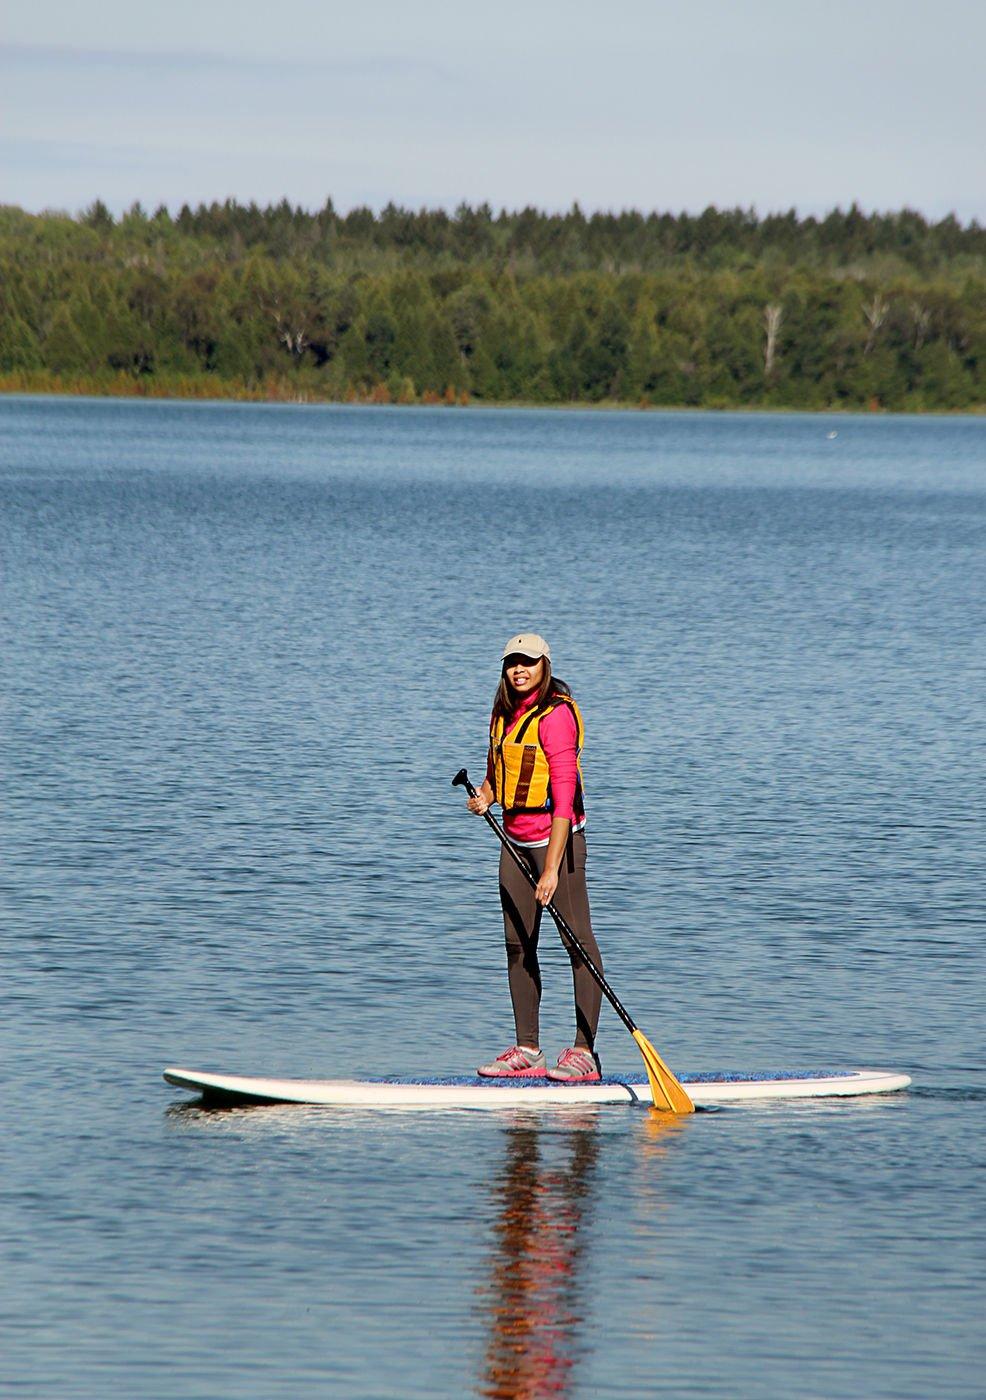 Writer Nicole Price stand-up paddleboarding in Wisconsin. (Photo / Jon Jarosh)